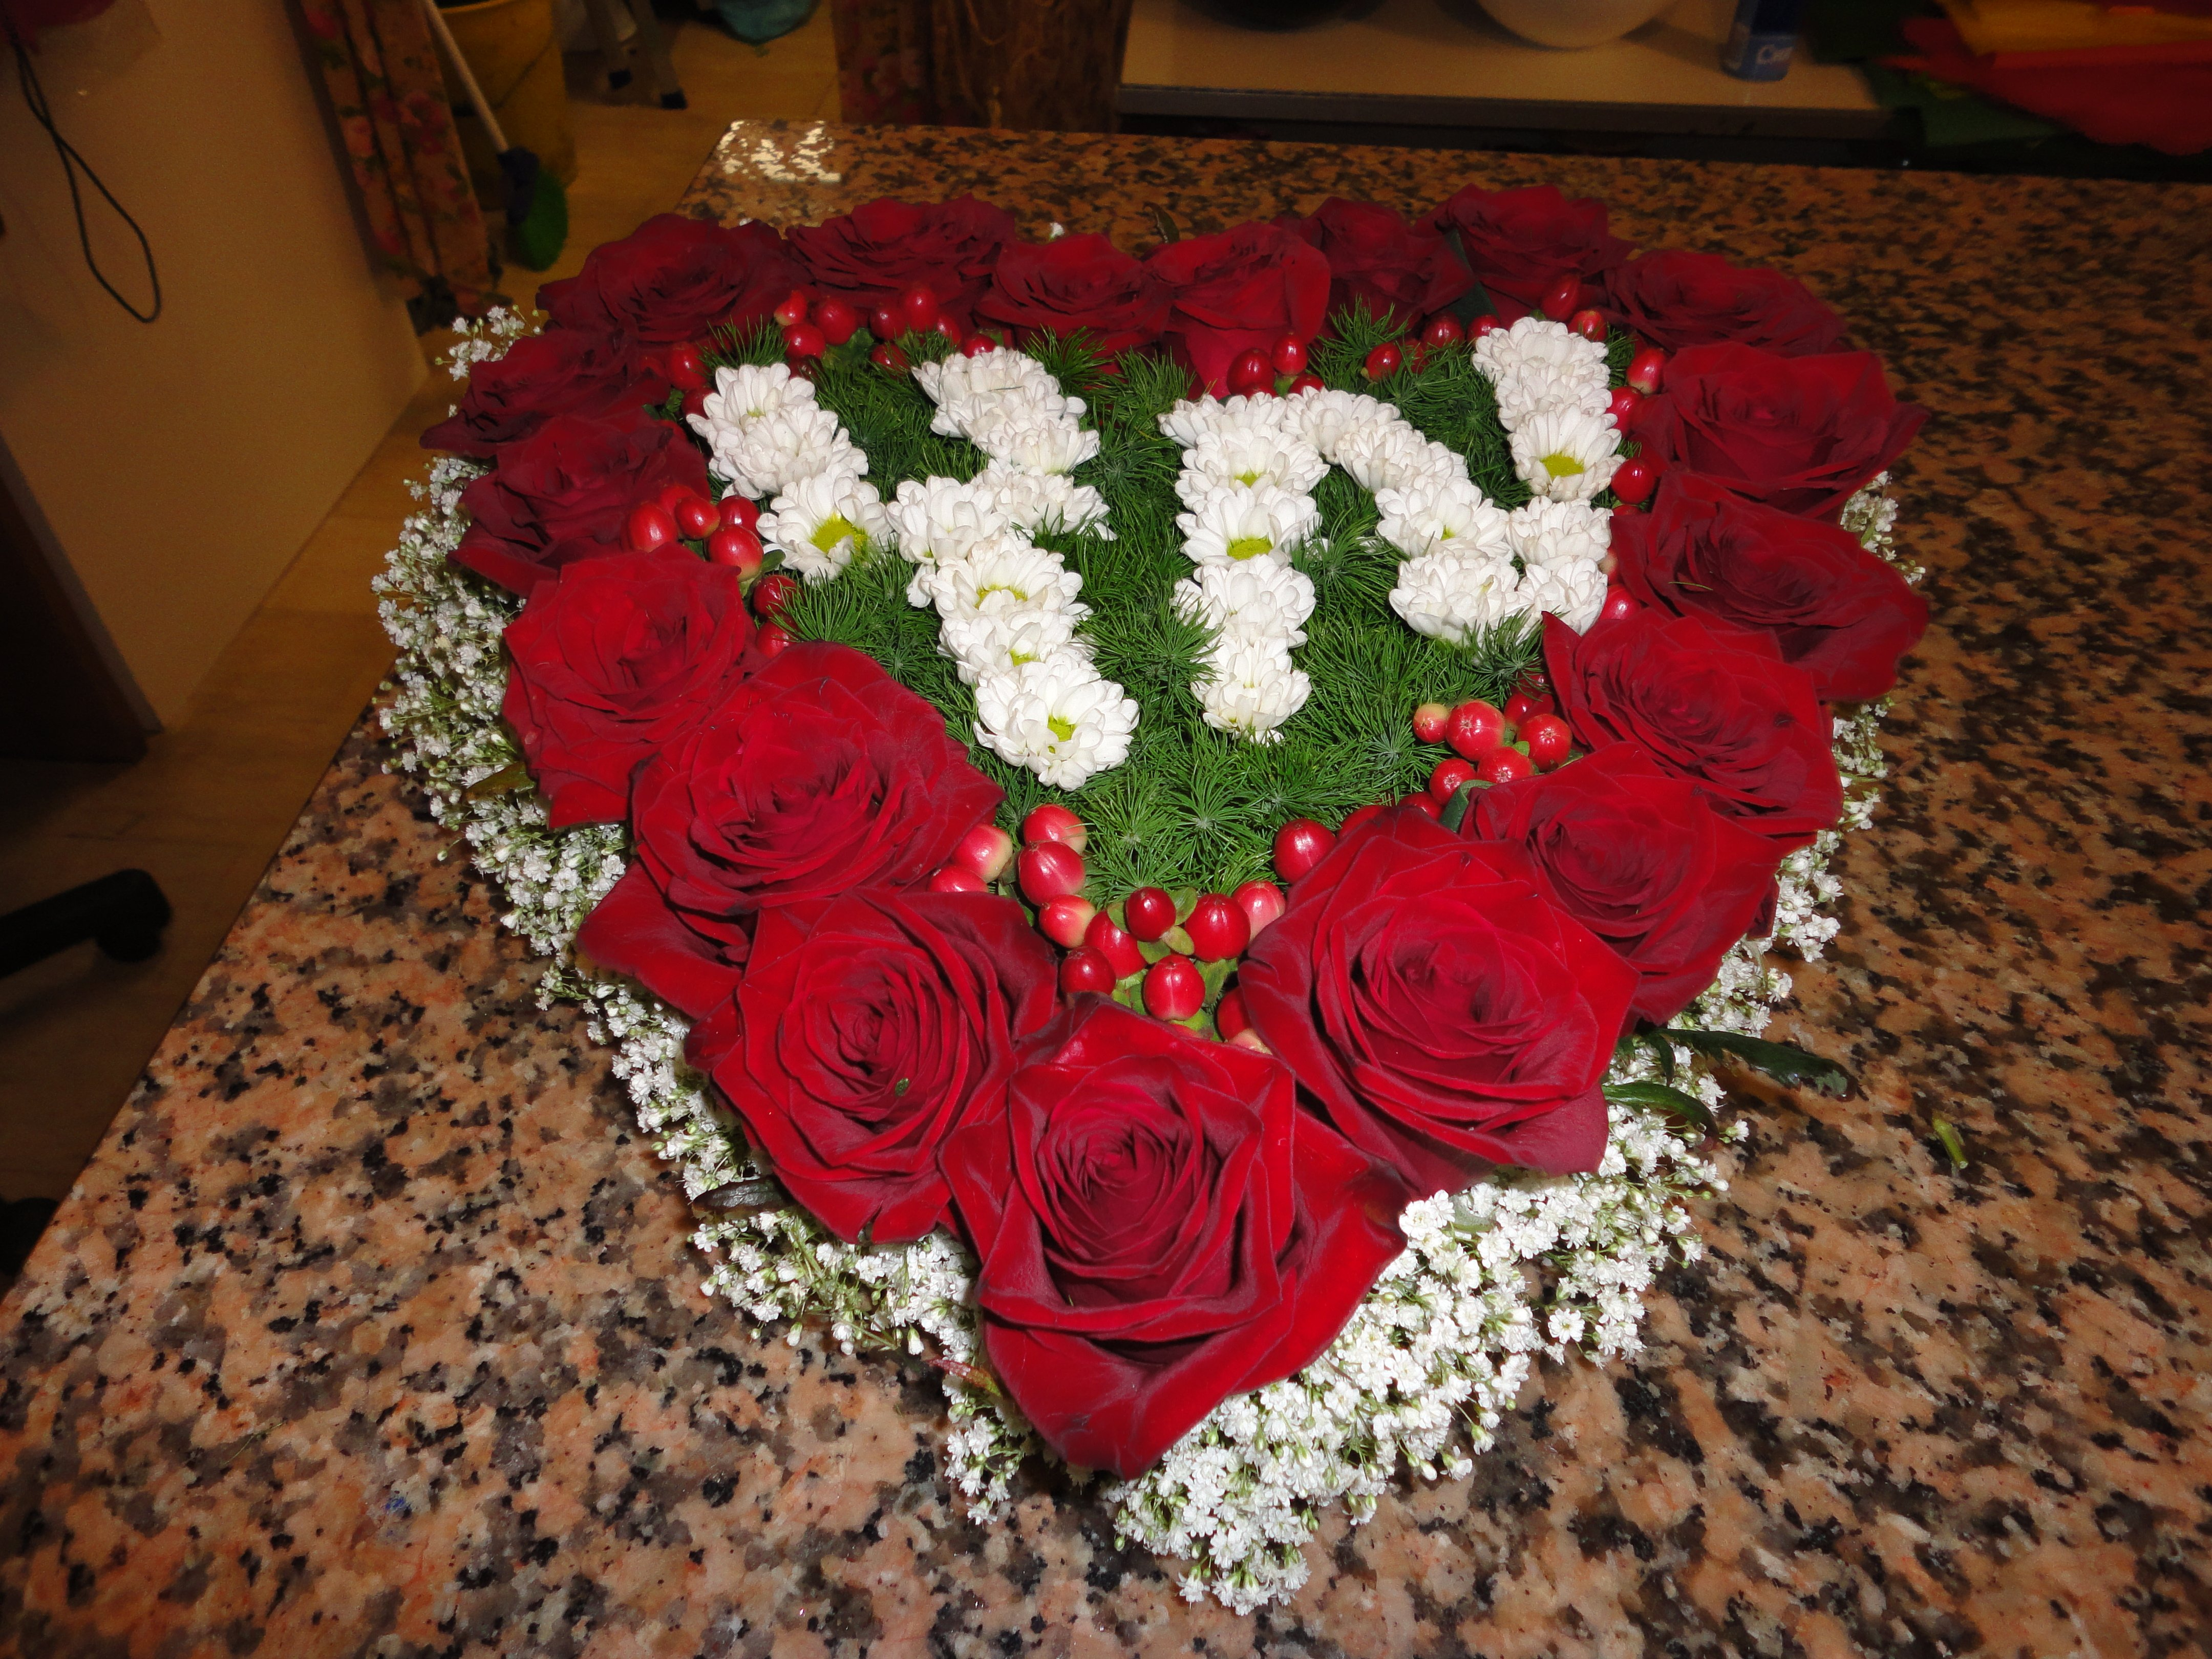 composizone floreale di rose rosse a forma di cuore